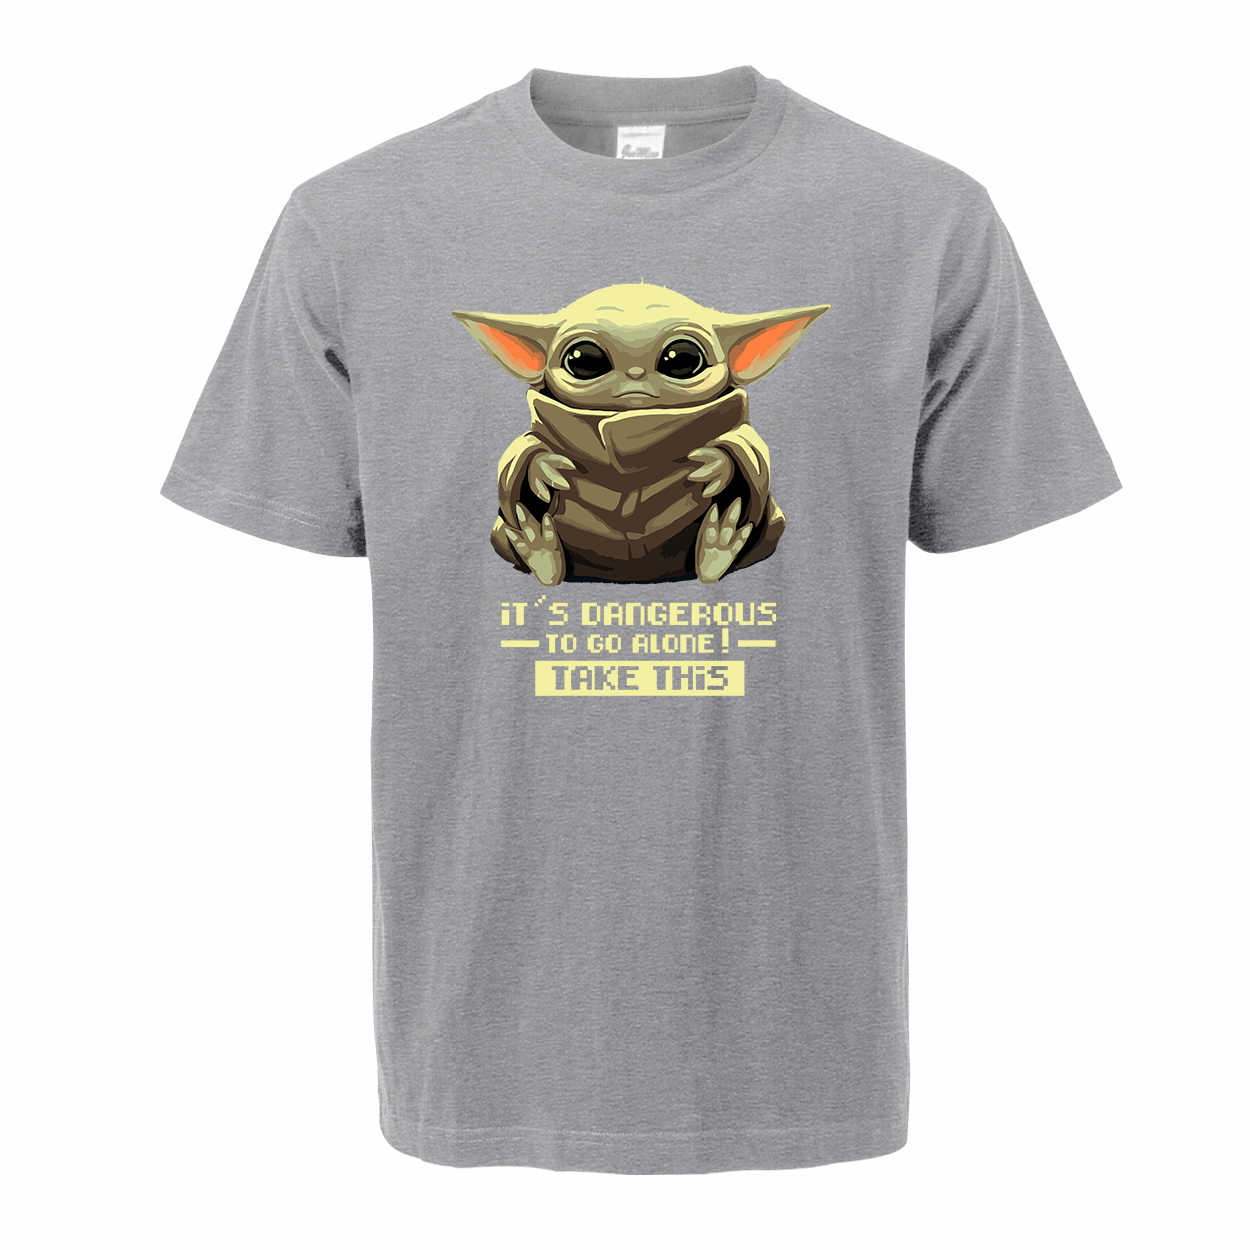 Baby Yoda De Mandalorian Mannen Zomer T-shirt 100% Katoen Ronde Hals Leuke Yoda T-shirt Kerst Tops Tees Star Wars streetwear